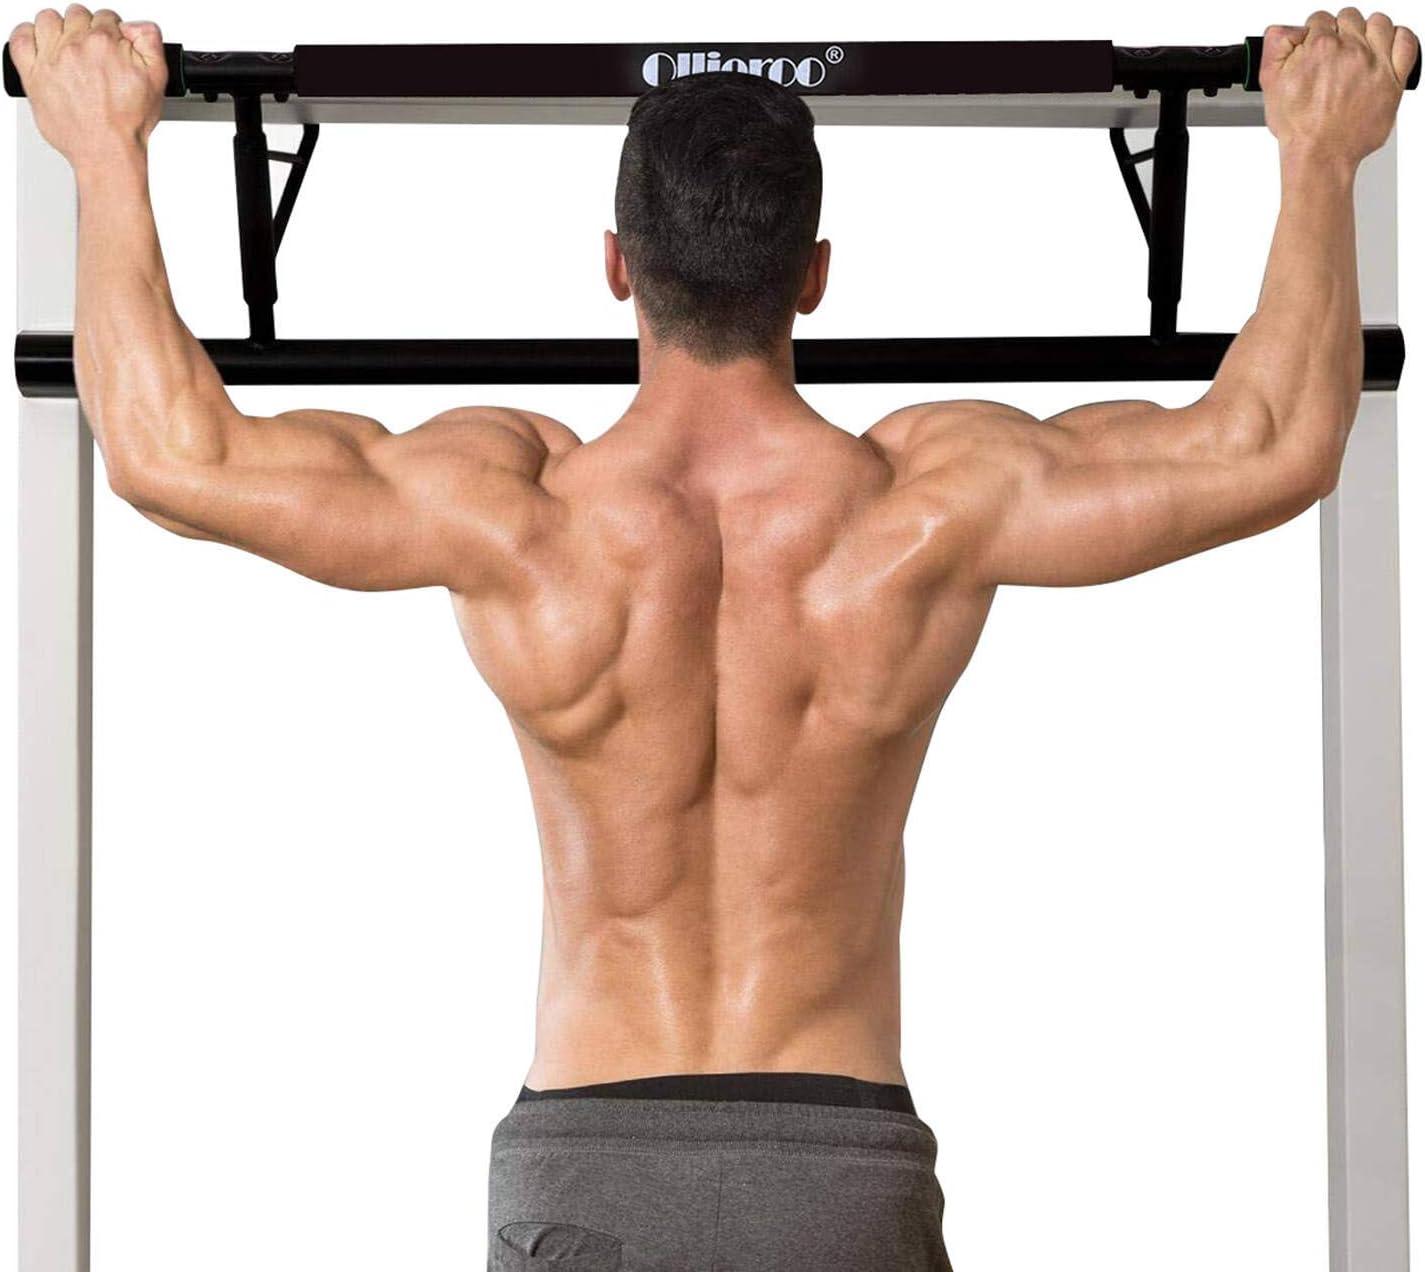 Ollieroo Pull Up Bar Sale SALE% OFF Rapid rise Doorway Strength Mult Chin Bars Training